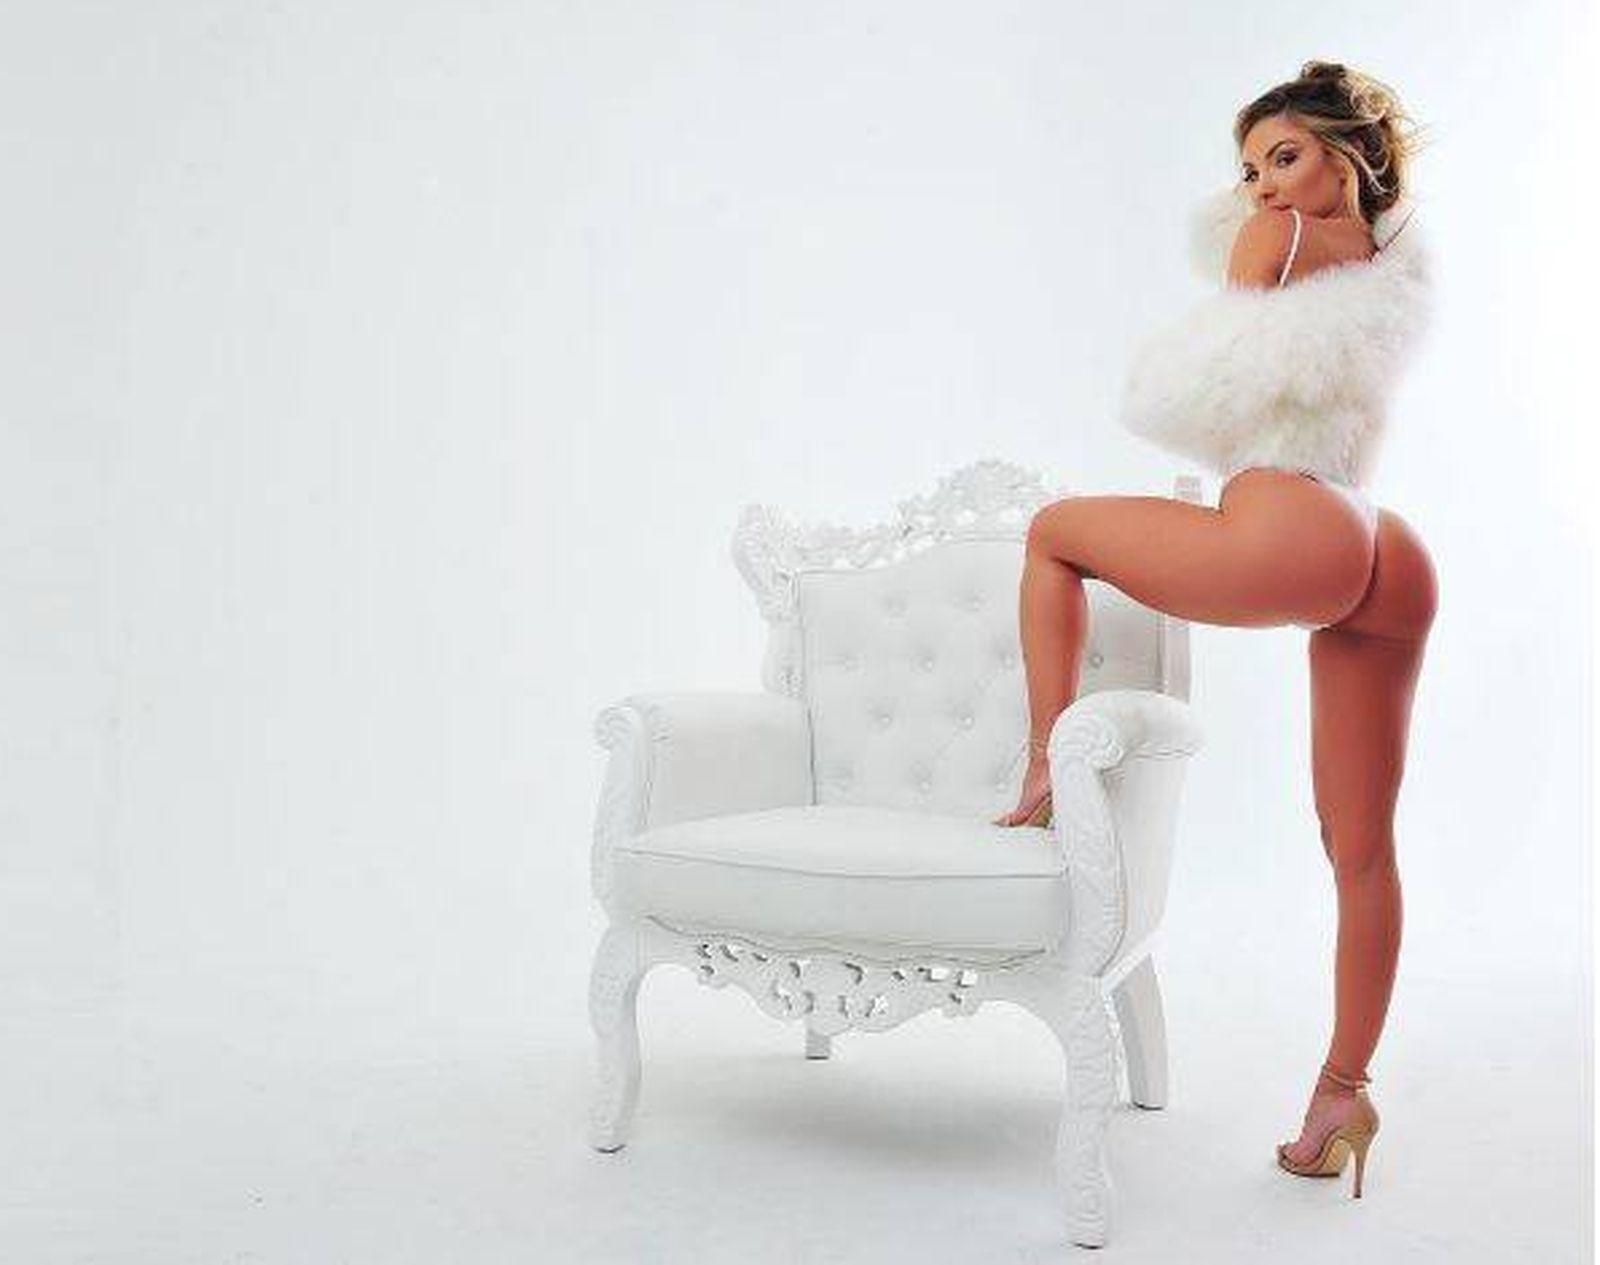 Pictures Delilah Belle Hamlin naked (19 photo), Pussy, Bikini, Boobs, braless 2019